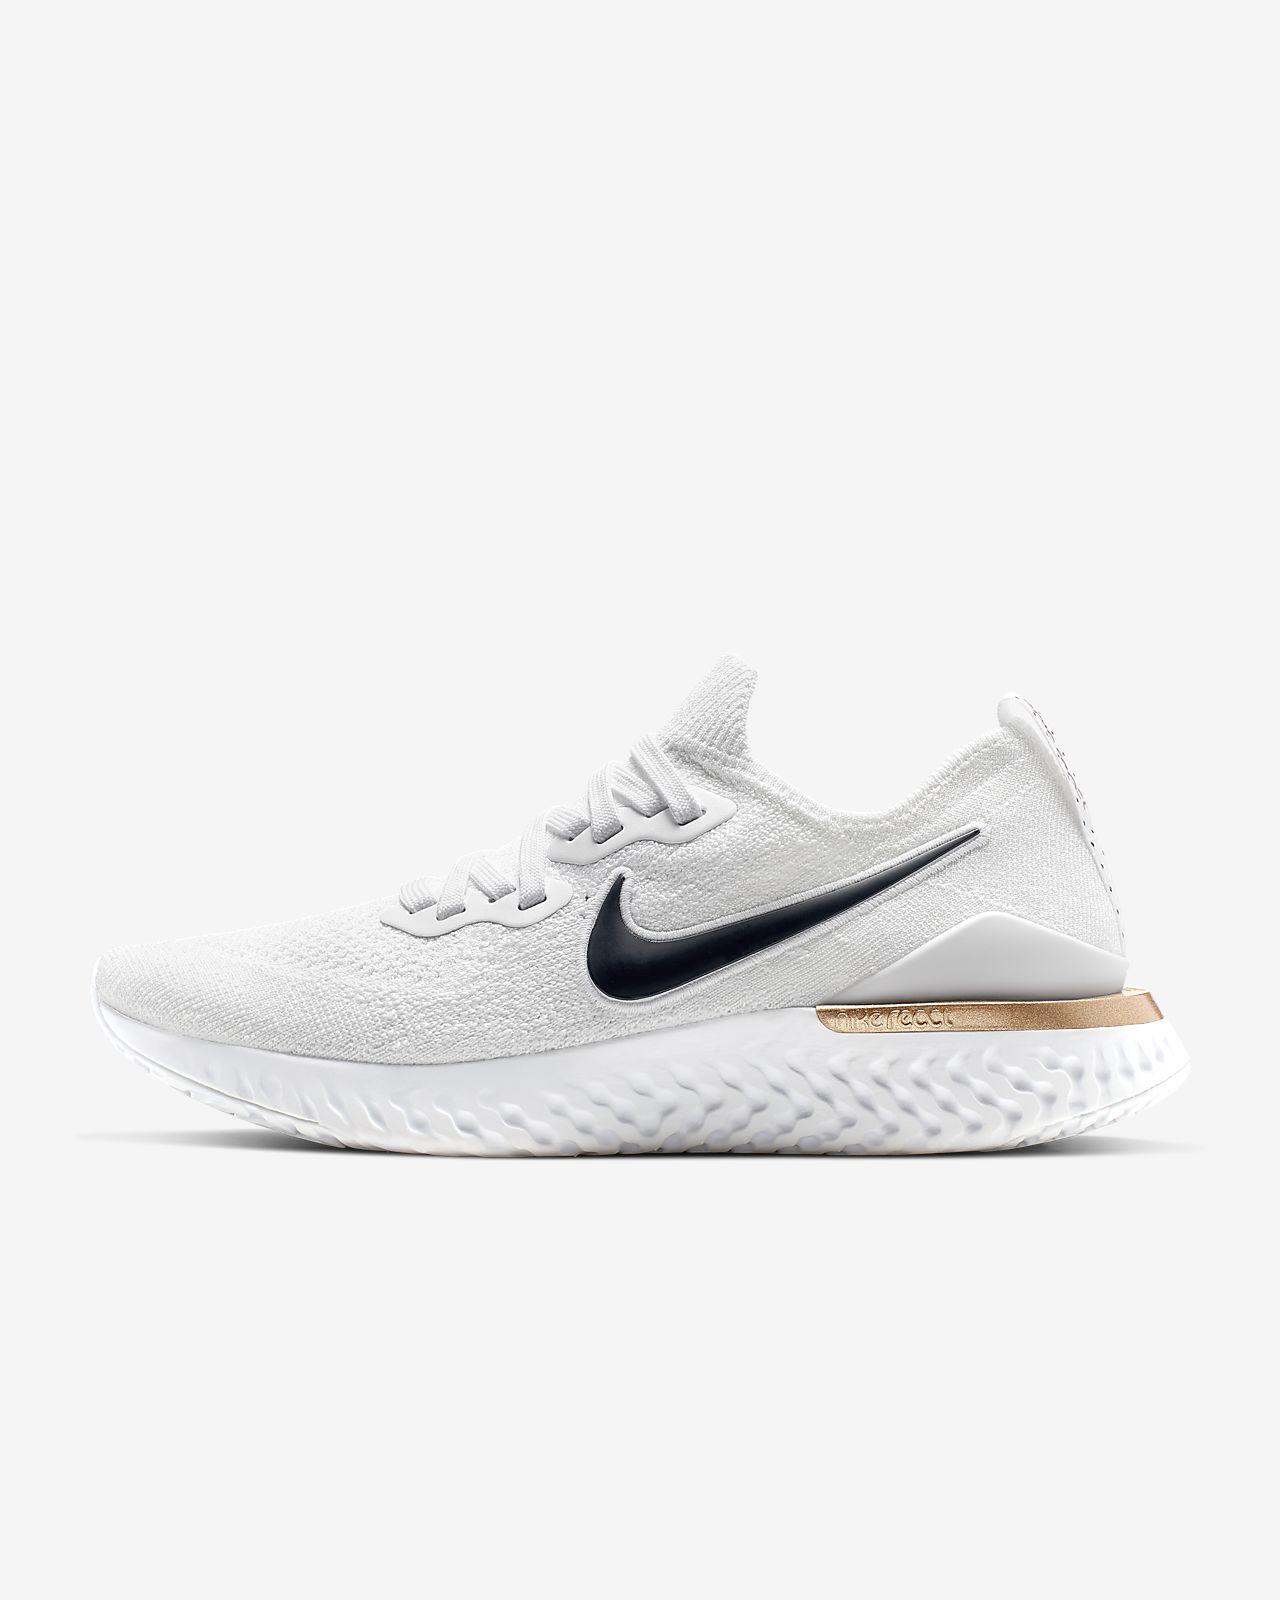 Totale Unité Fjlk1cu3t Da Running React Donna Flyknit Scarpa Nike Epic 2 w8NnX0OPk